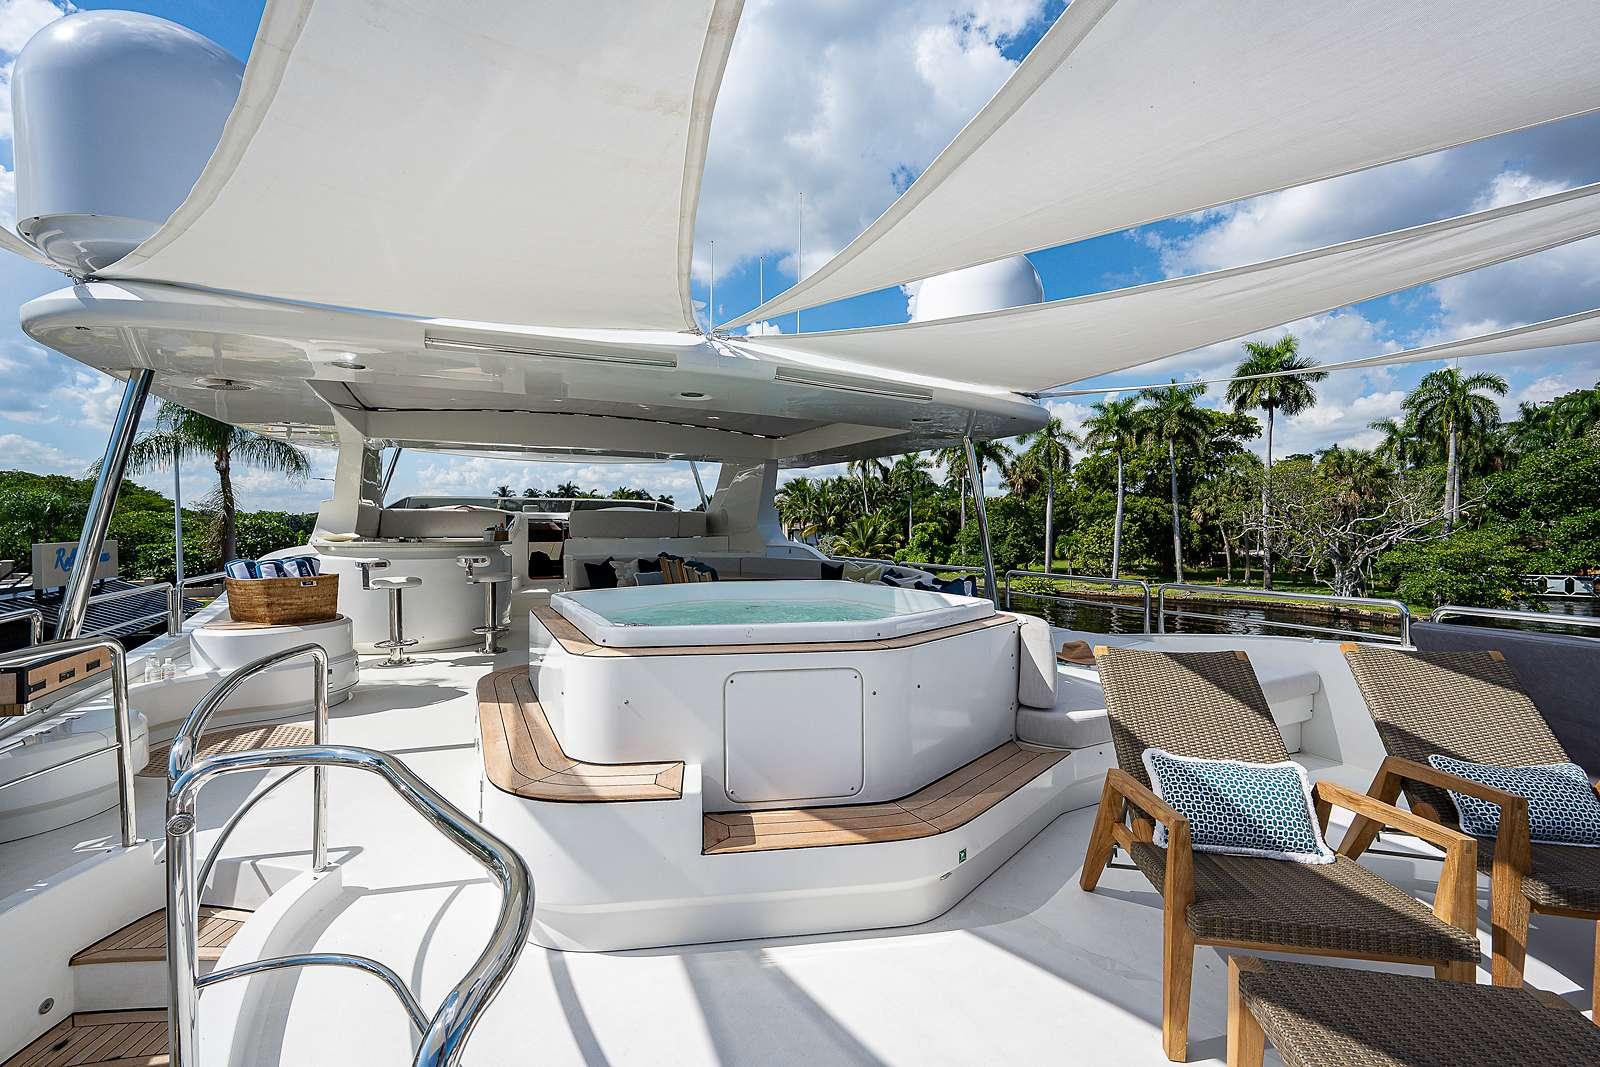 Image of Sweet Emocean yacht #18